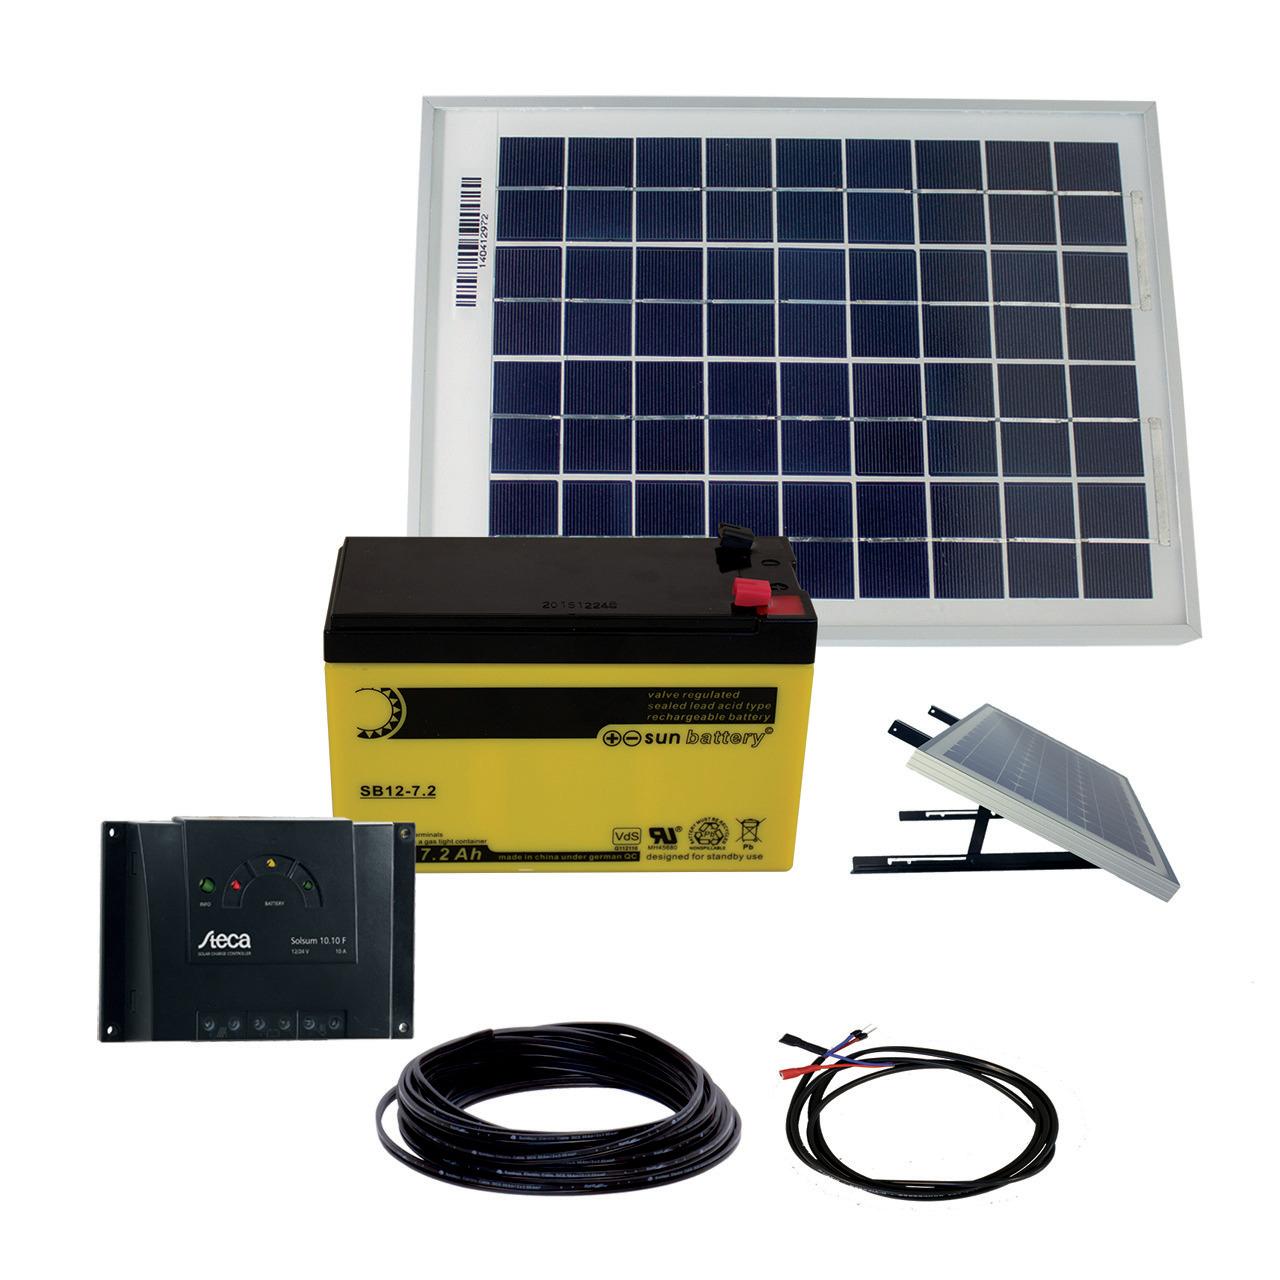 Phaesun Solarstrom-Set mit Akku-  10 W inkl- 6 A Solarladeregler